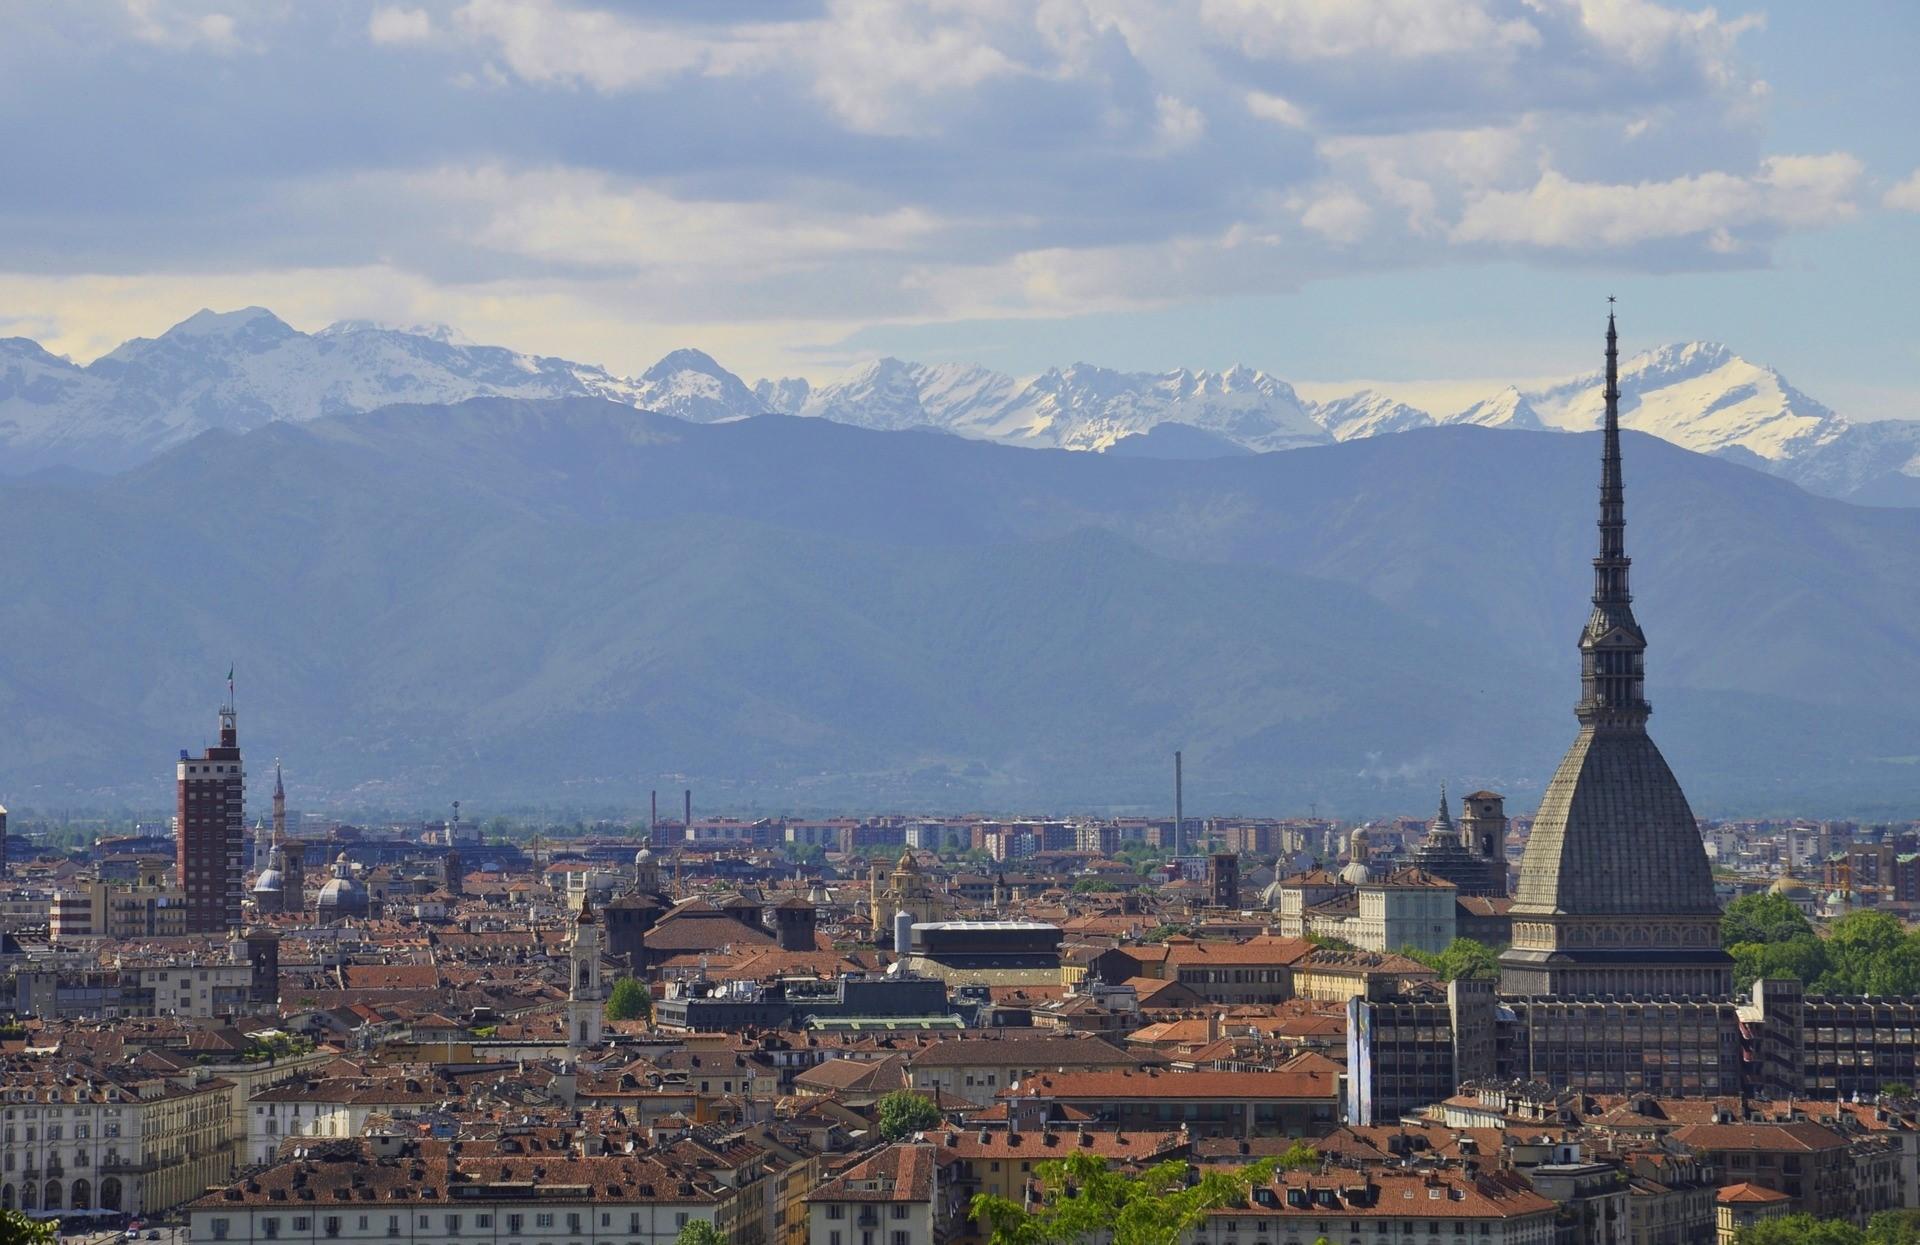 Piemonte cover image